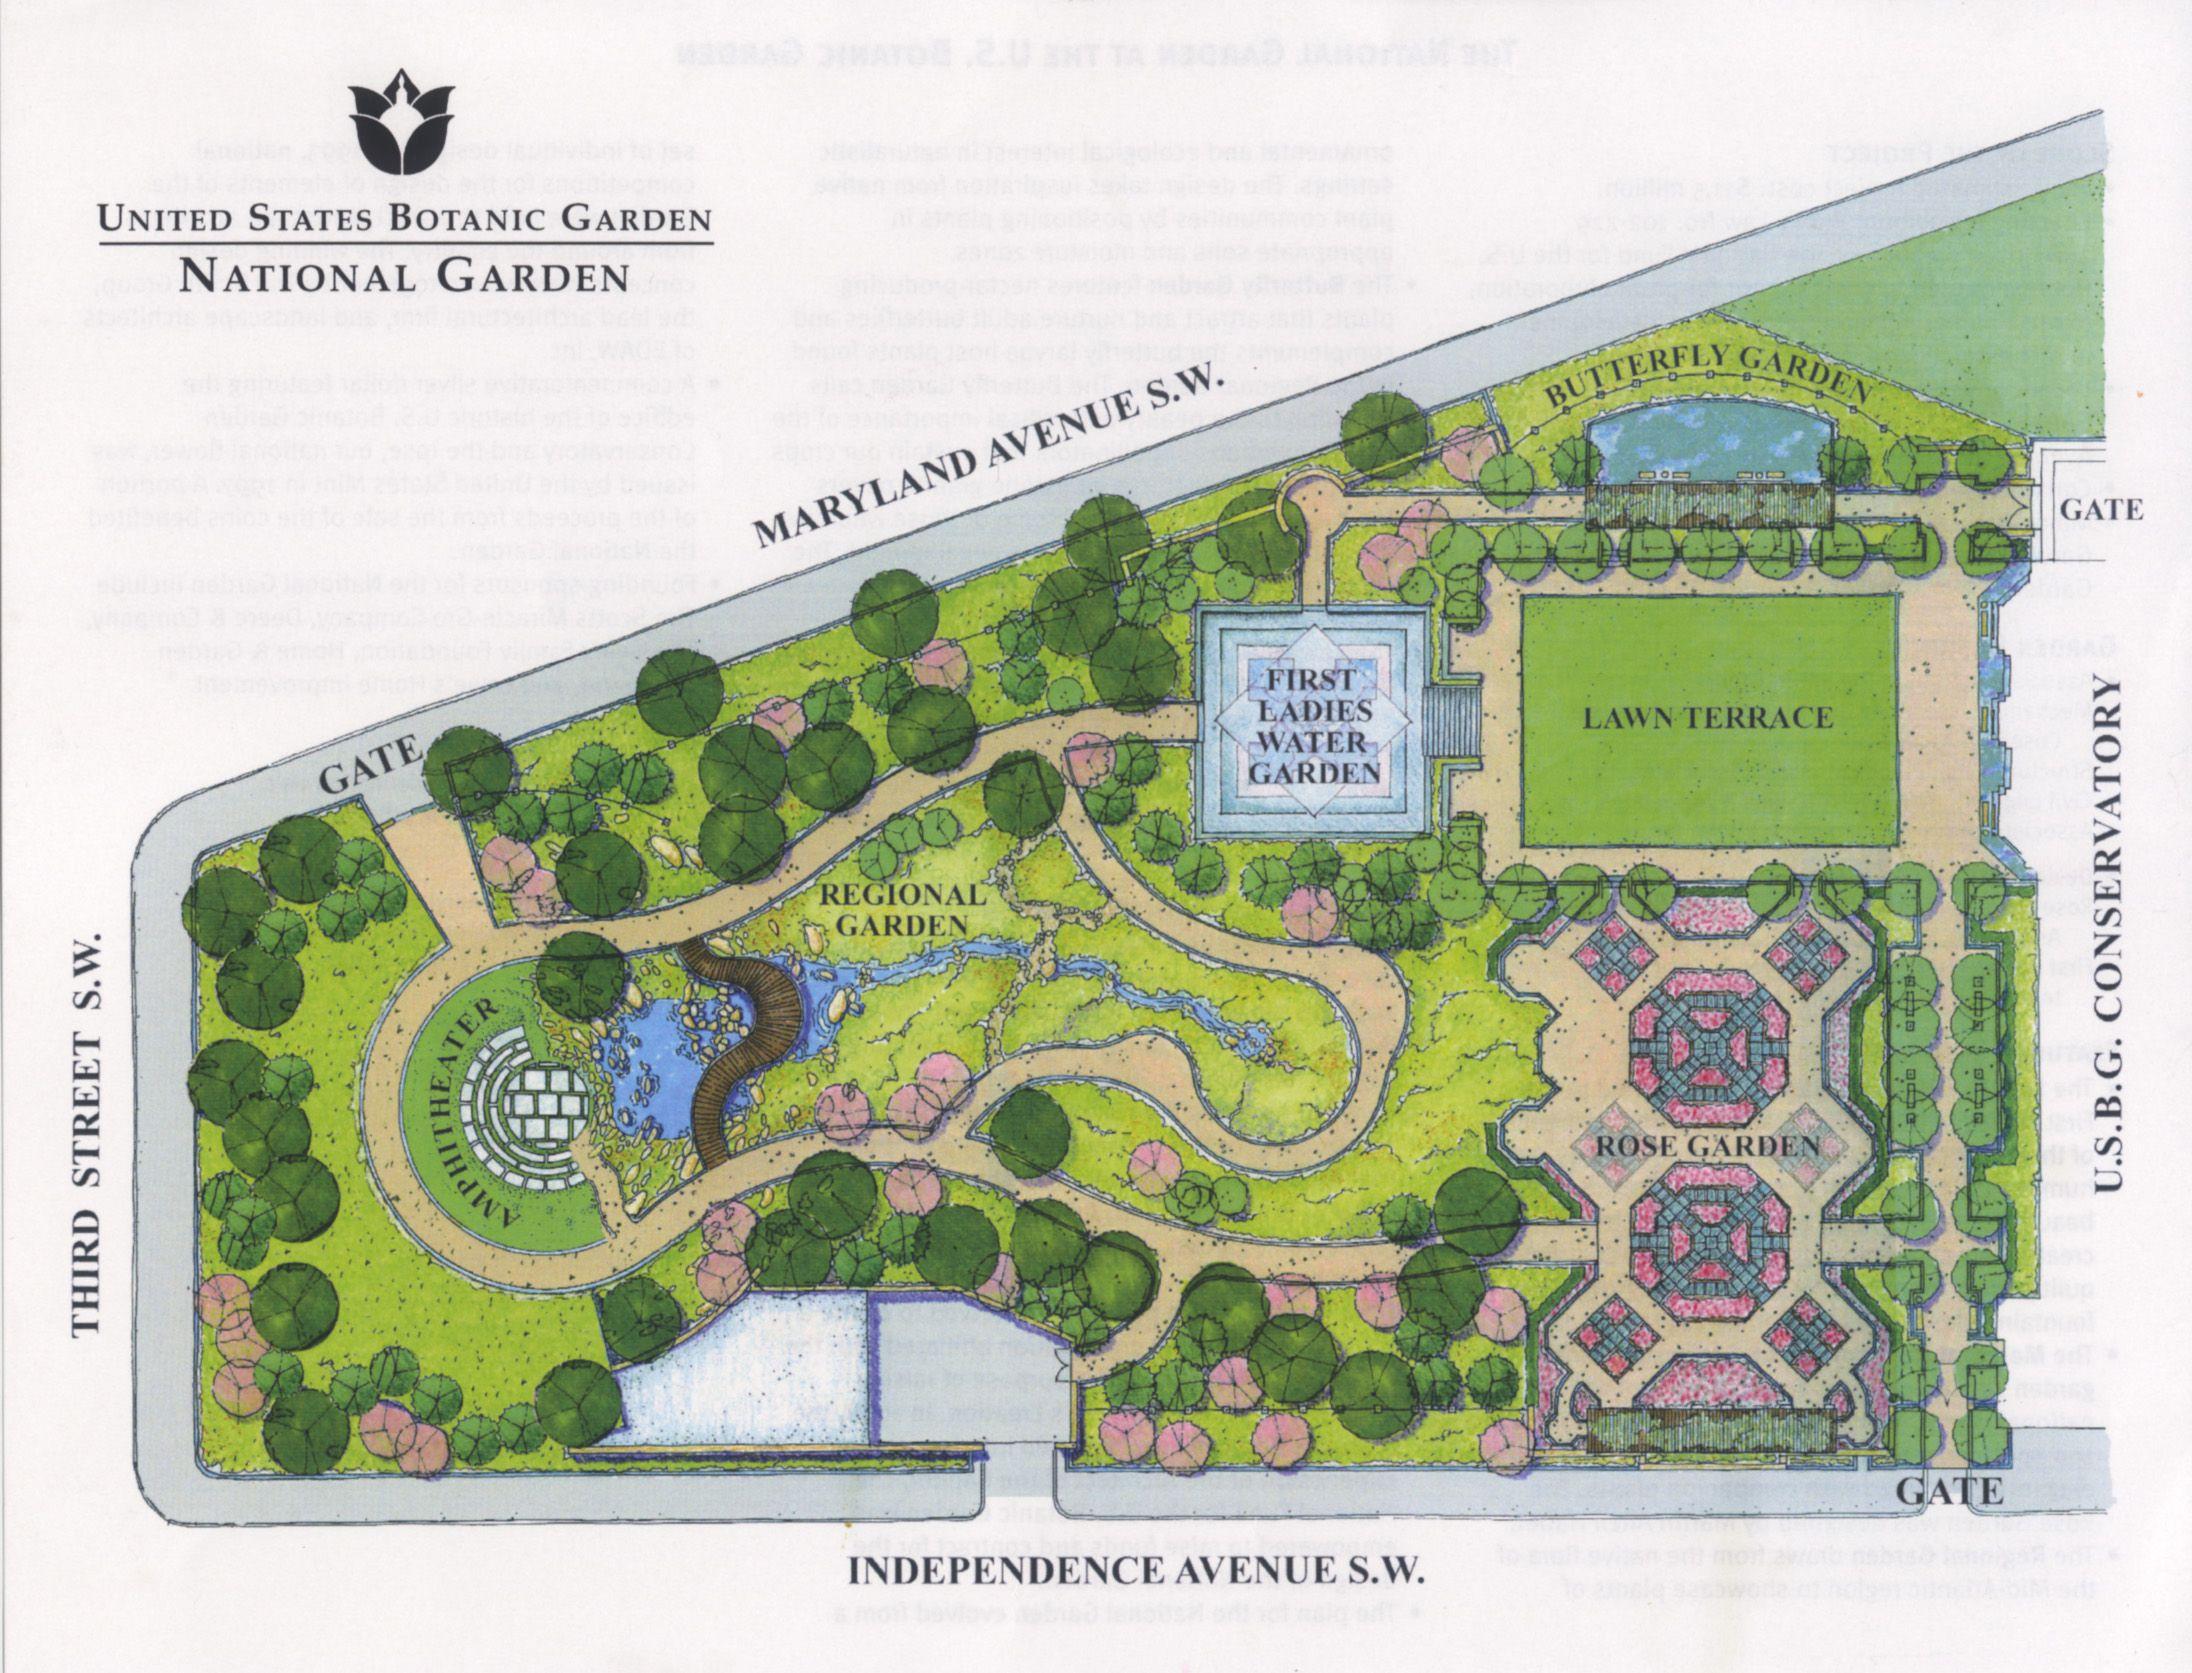 parks perimeter and area garden